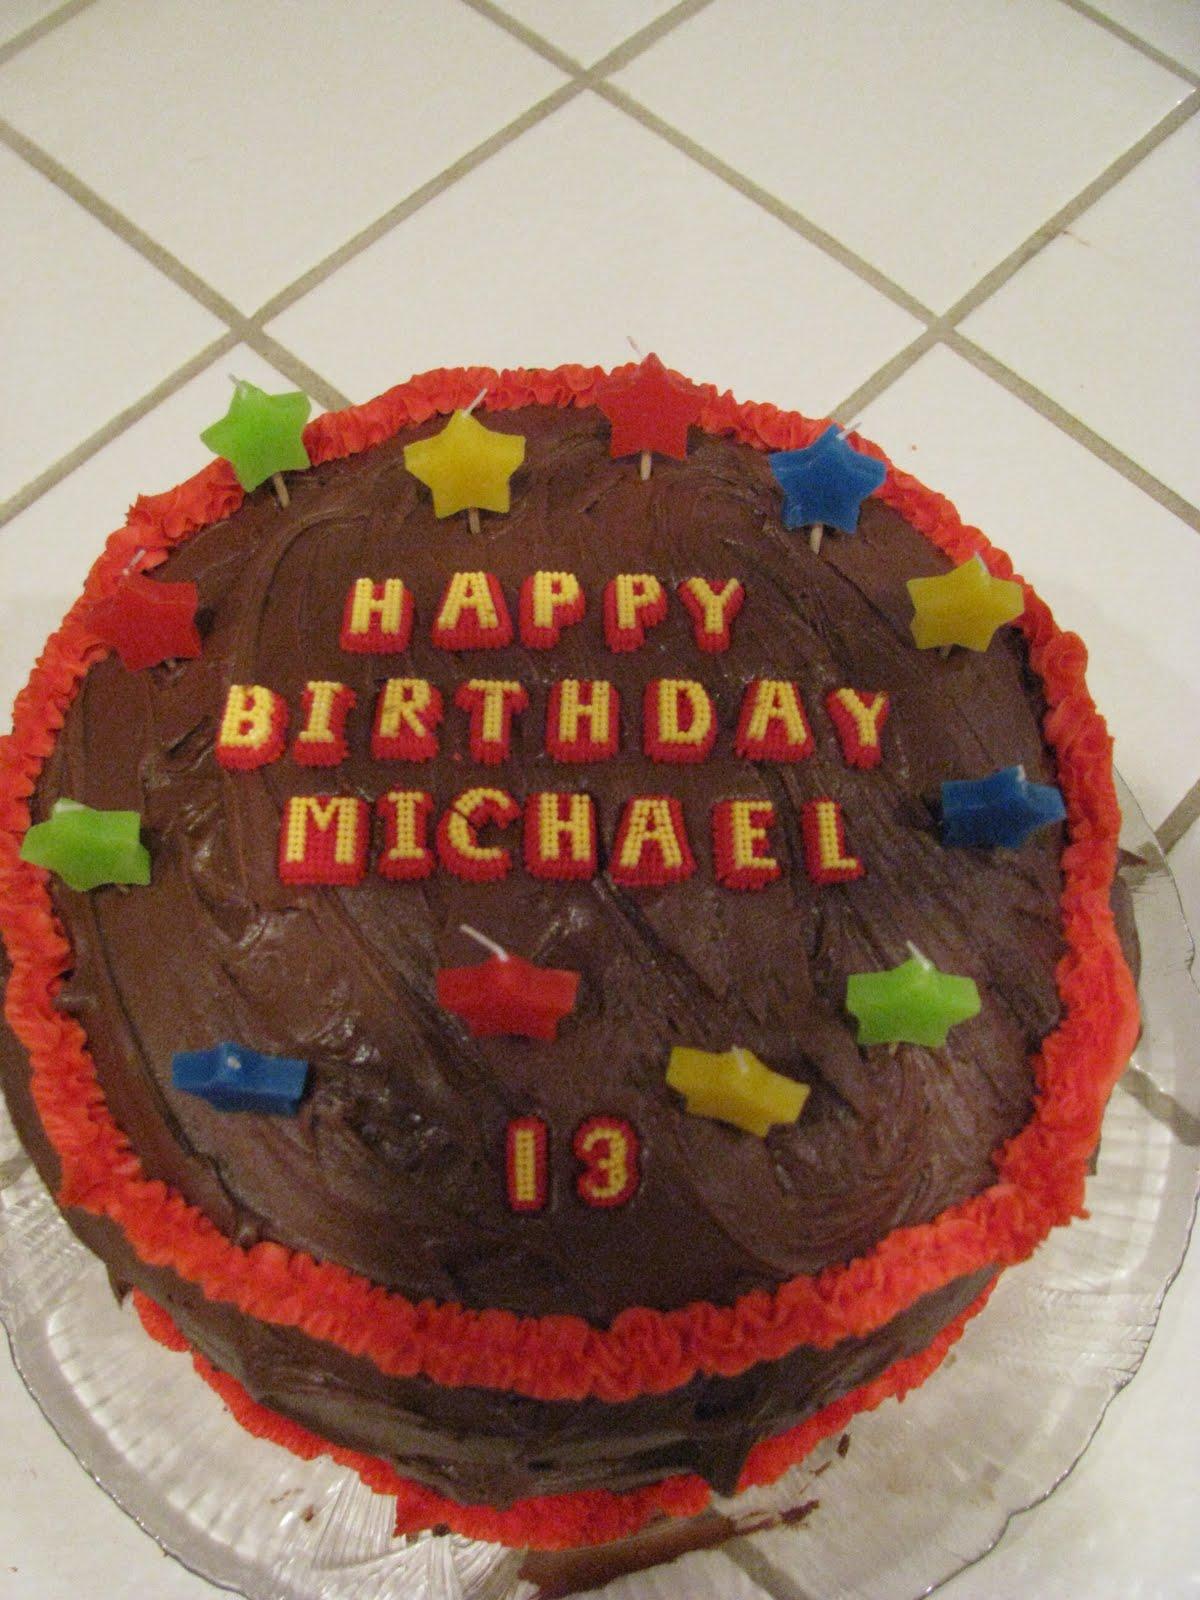 Family of Four: Happy Birthday Michael!